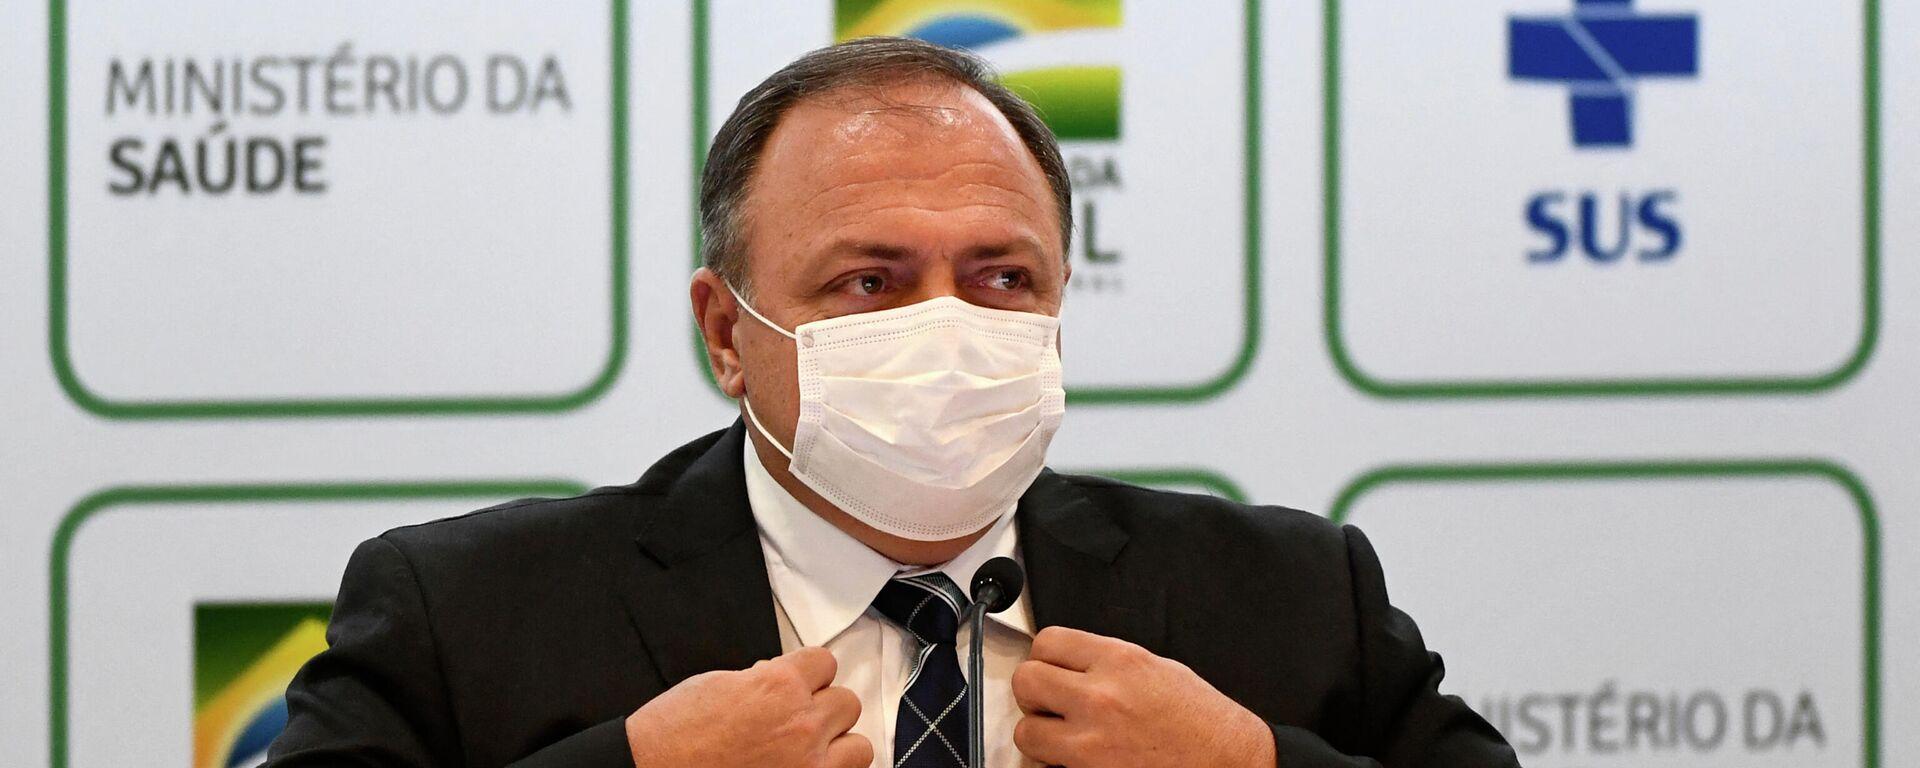 Eduardo Pazuello, exministro de Salud de Brasil - Sputnik Mundo, 1920, 14.04.2021